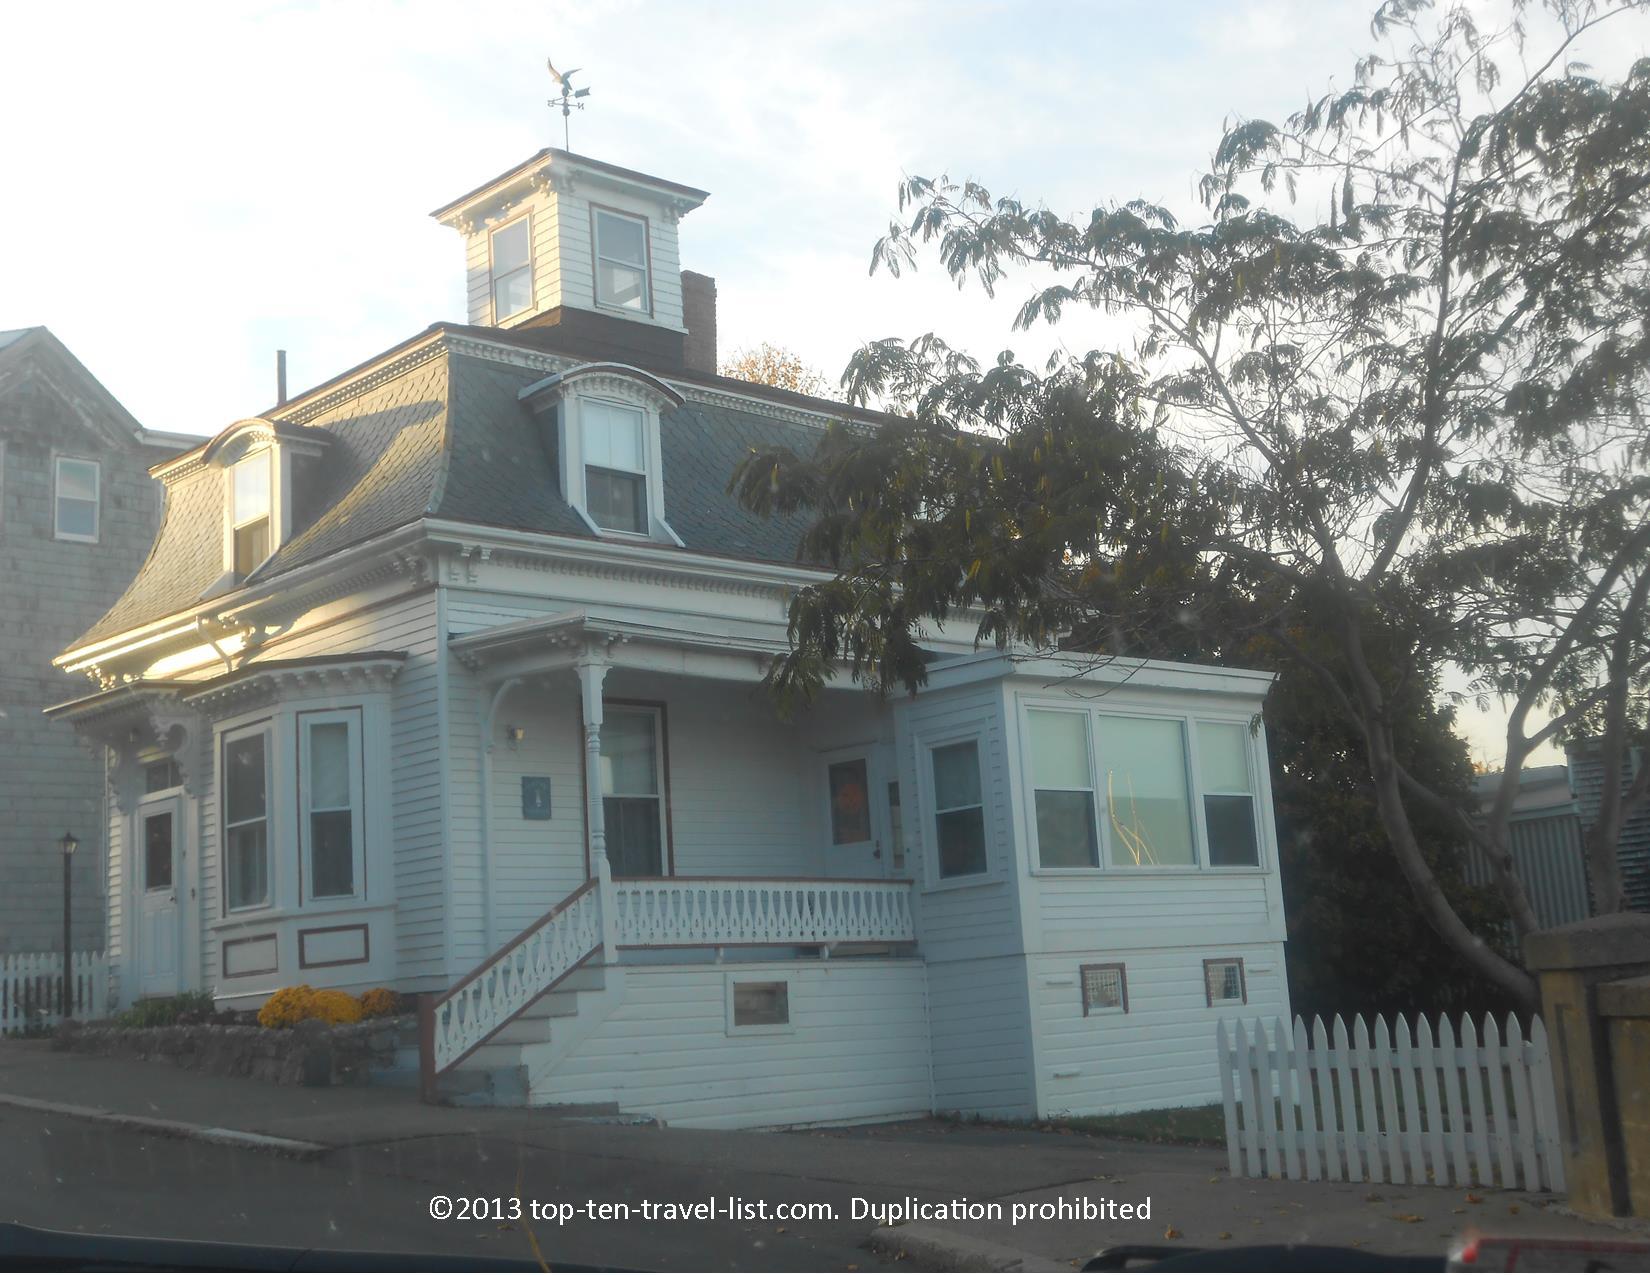 Max and Dani's house from Hocus Pocus in Salem, Massachsuetts